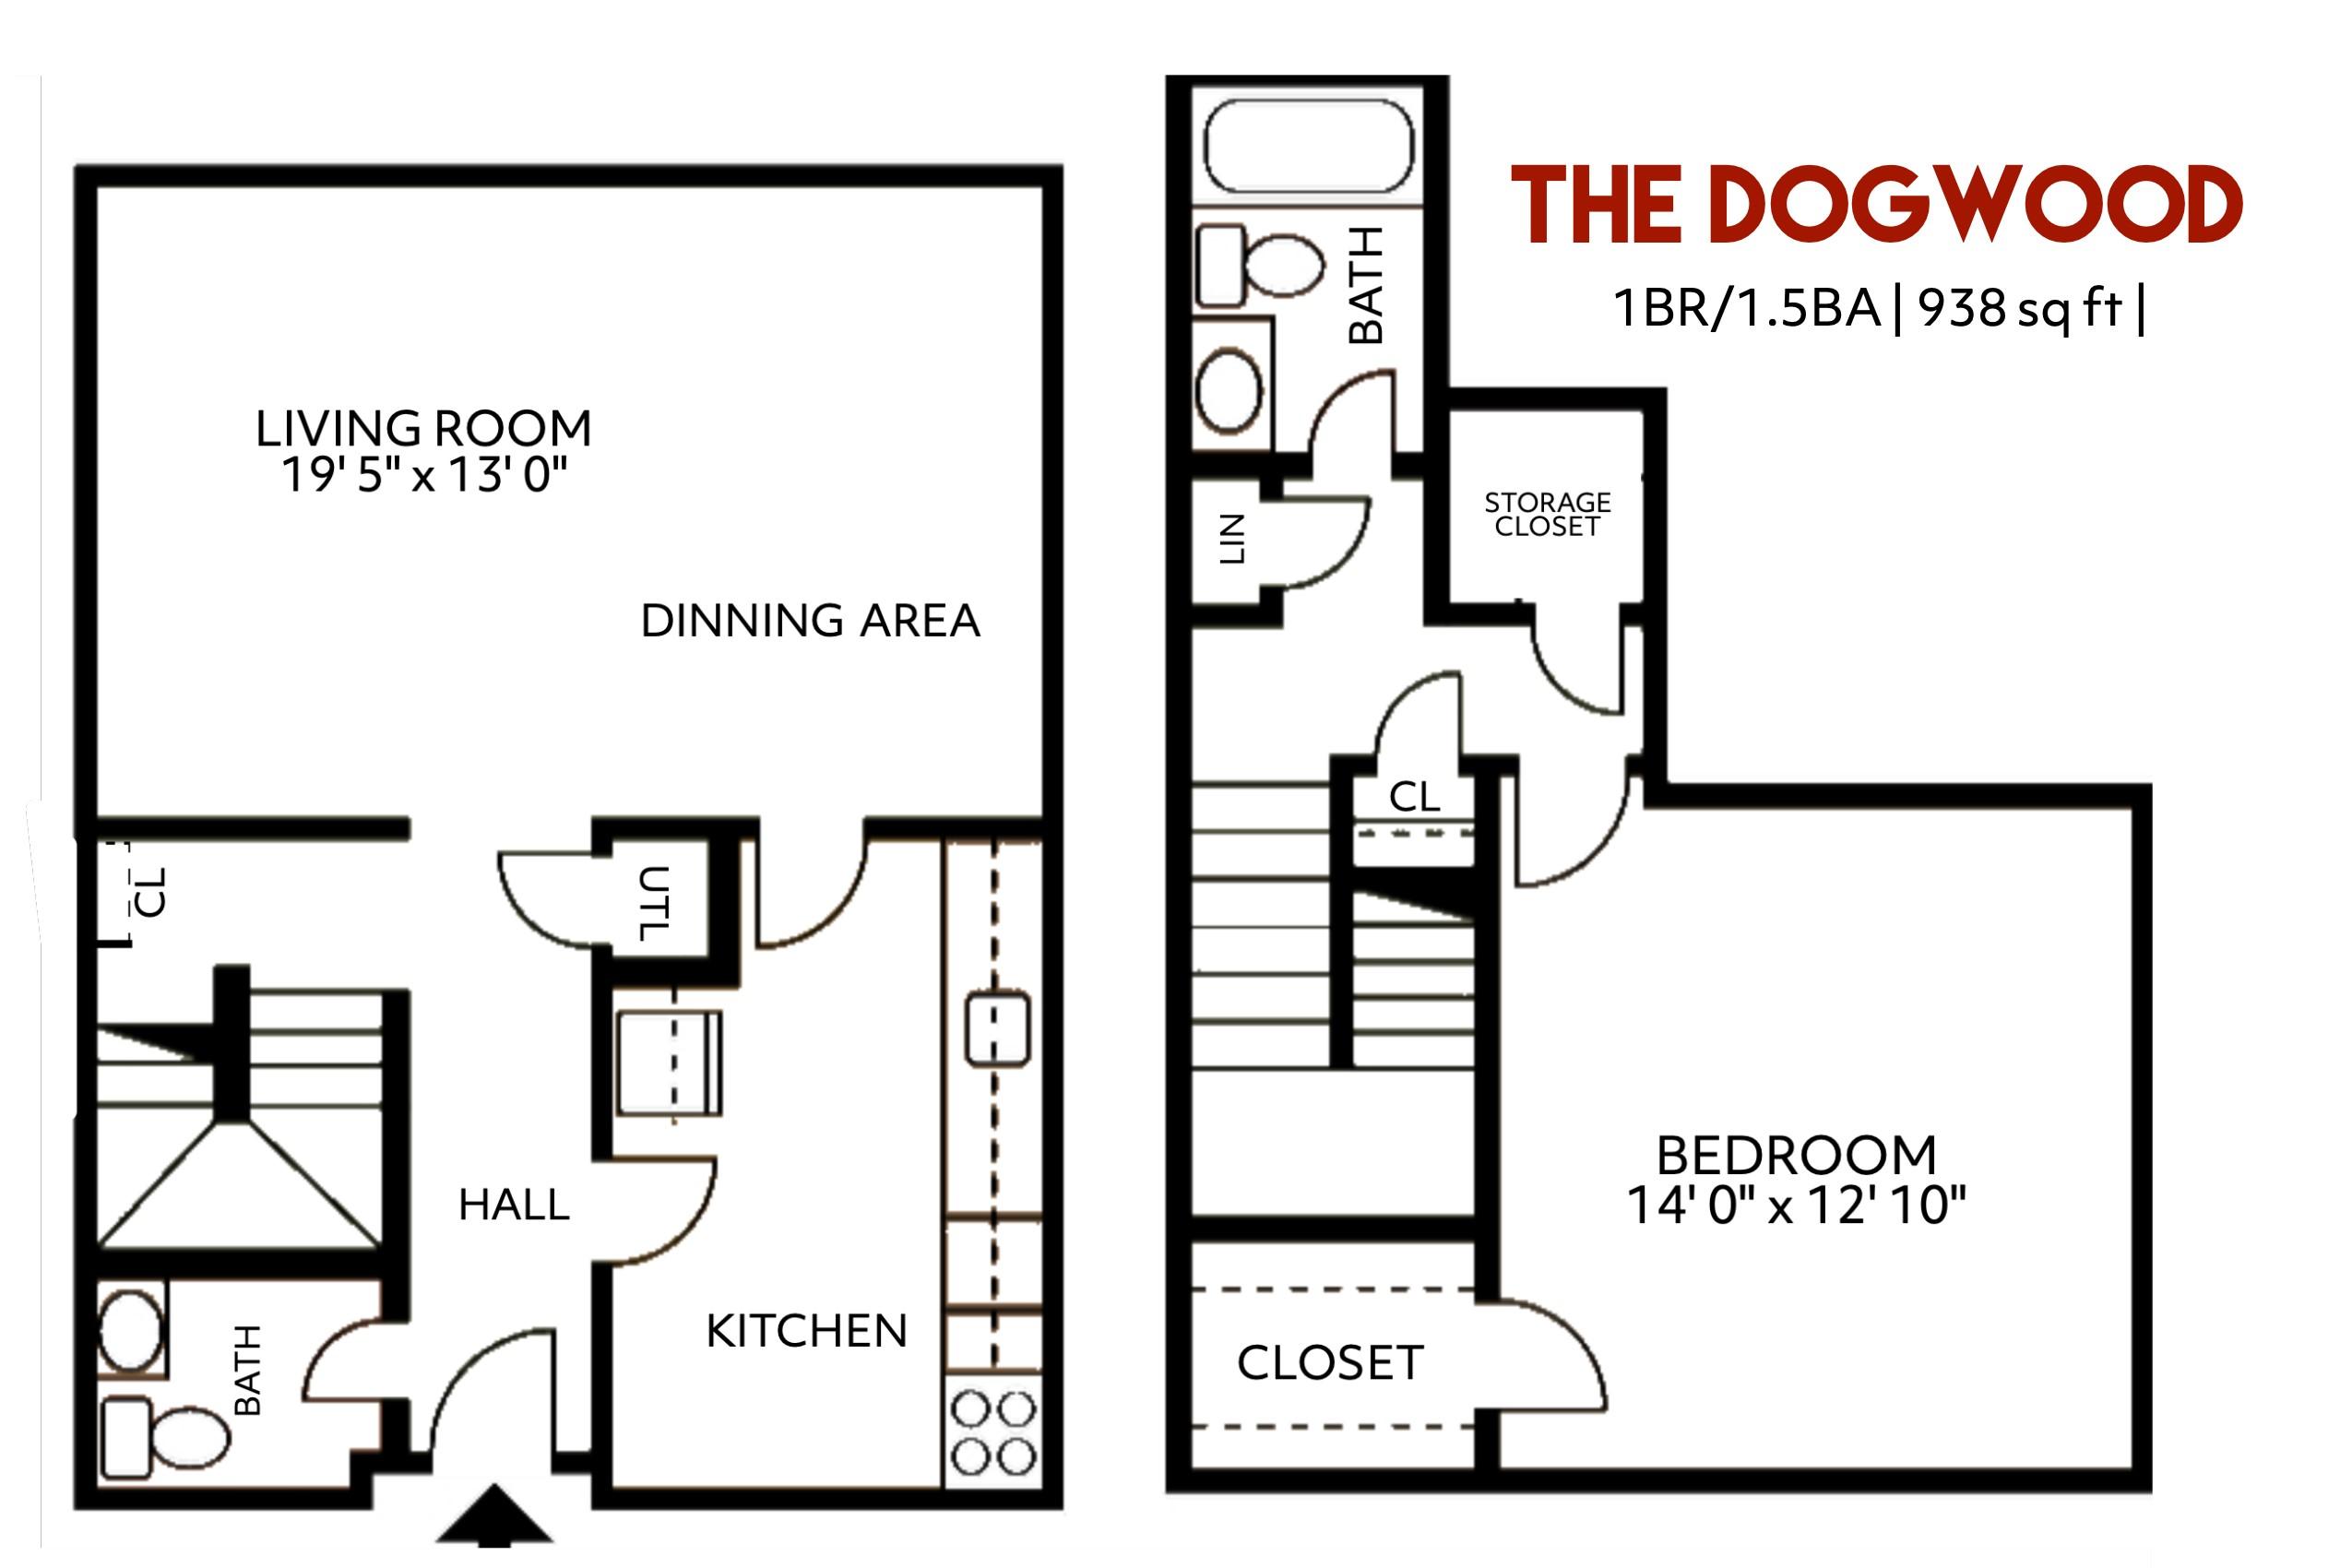 The Dogwood Floorplan